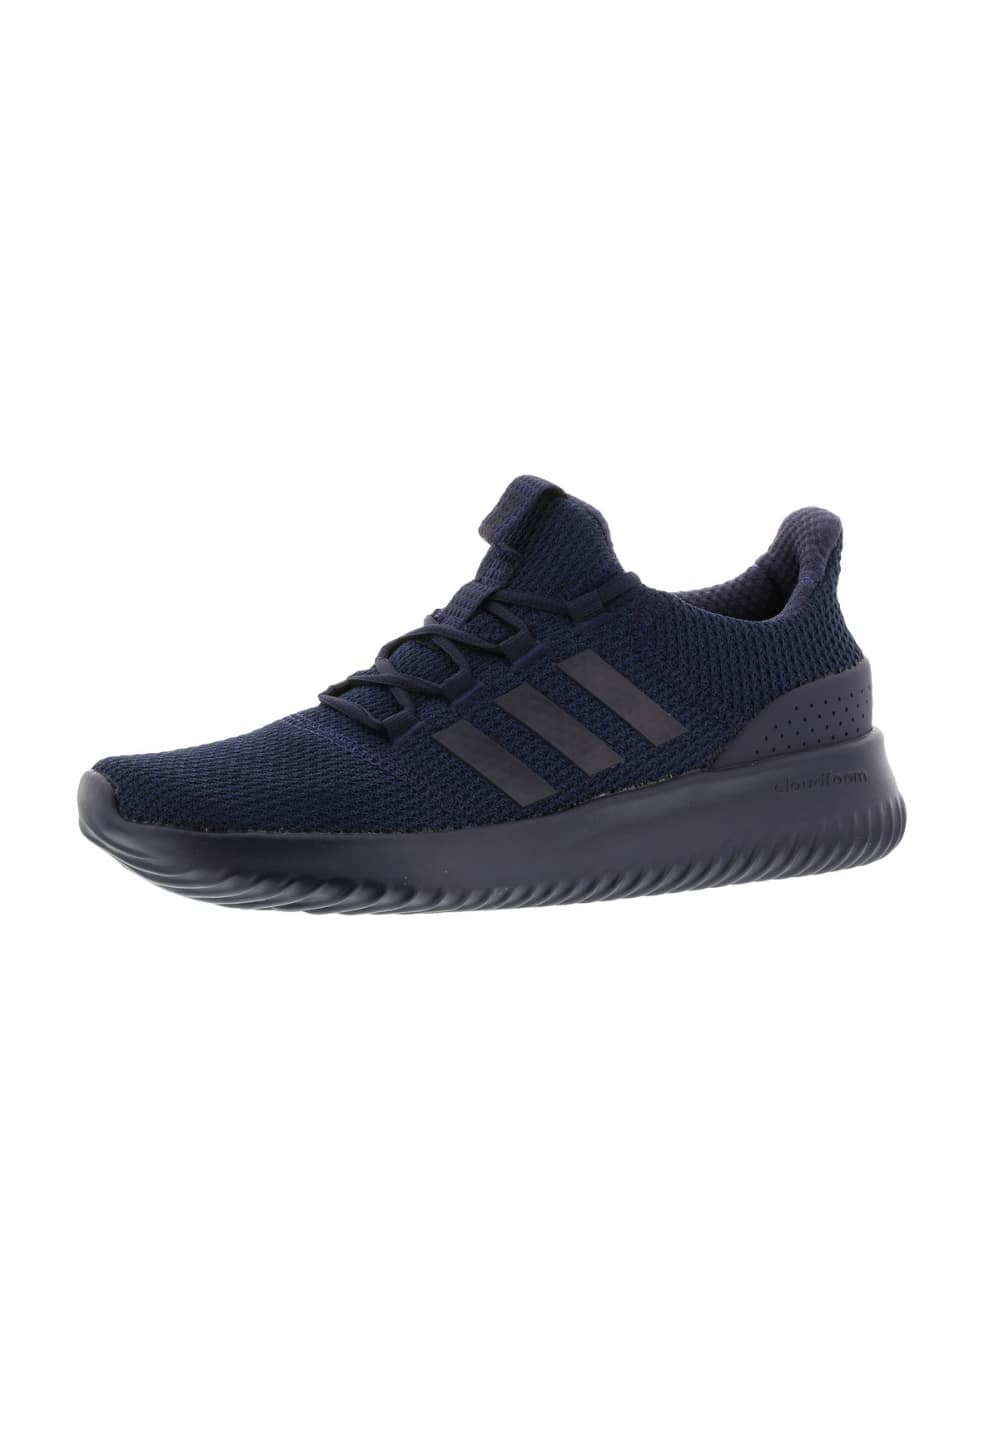 adidas neo Cloudfoam Ultimate - Laufschuhe für Herren - Blau